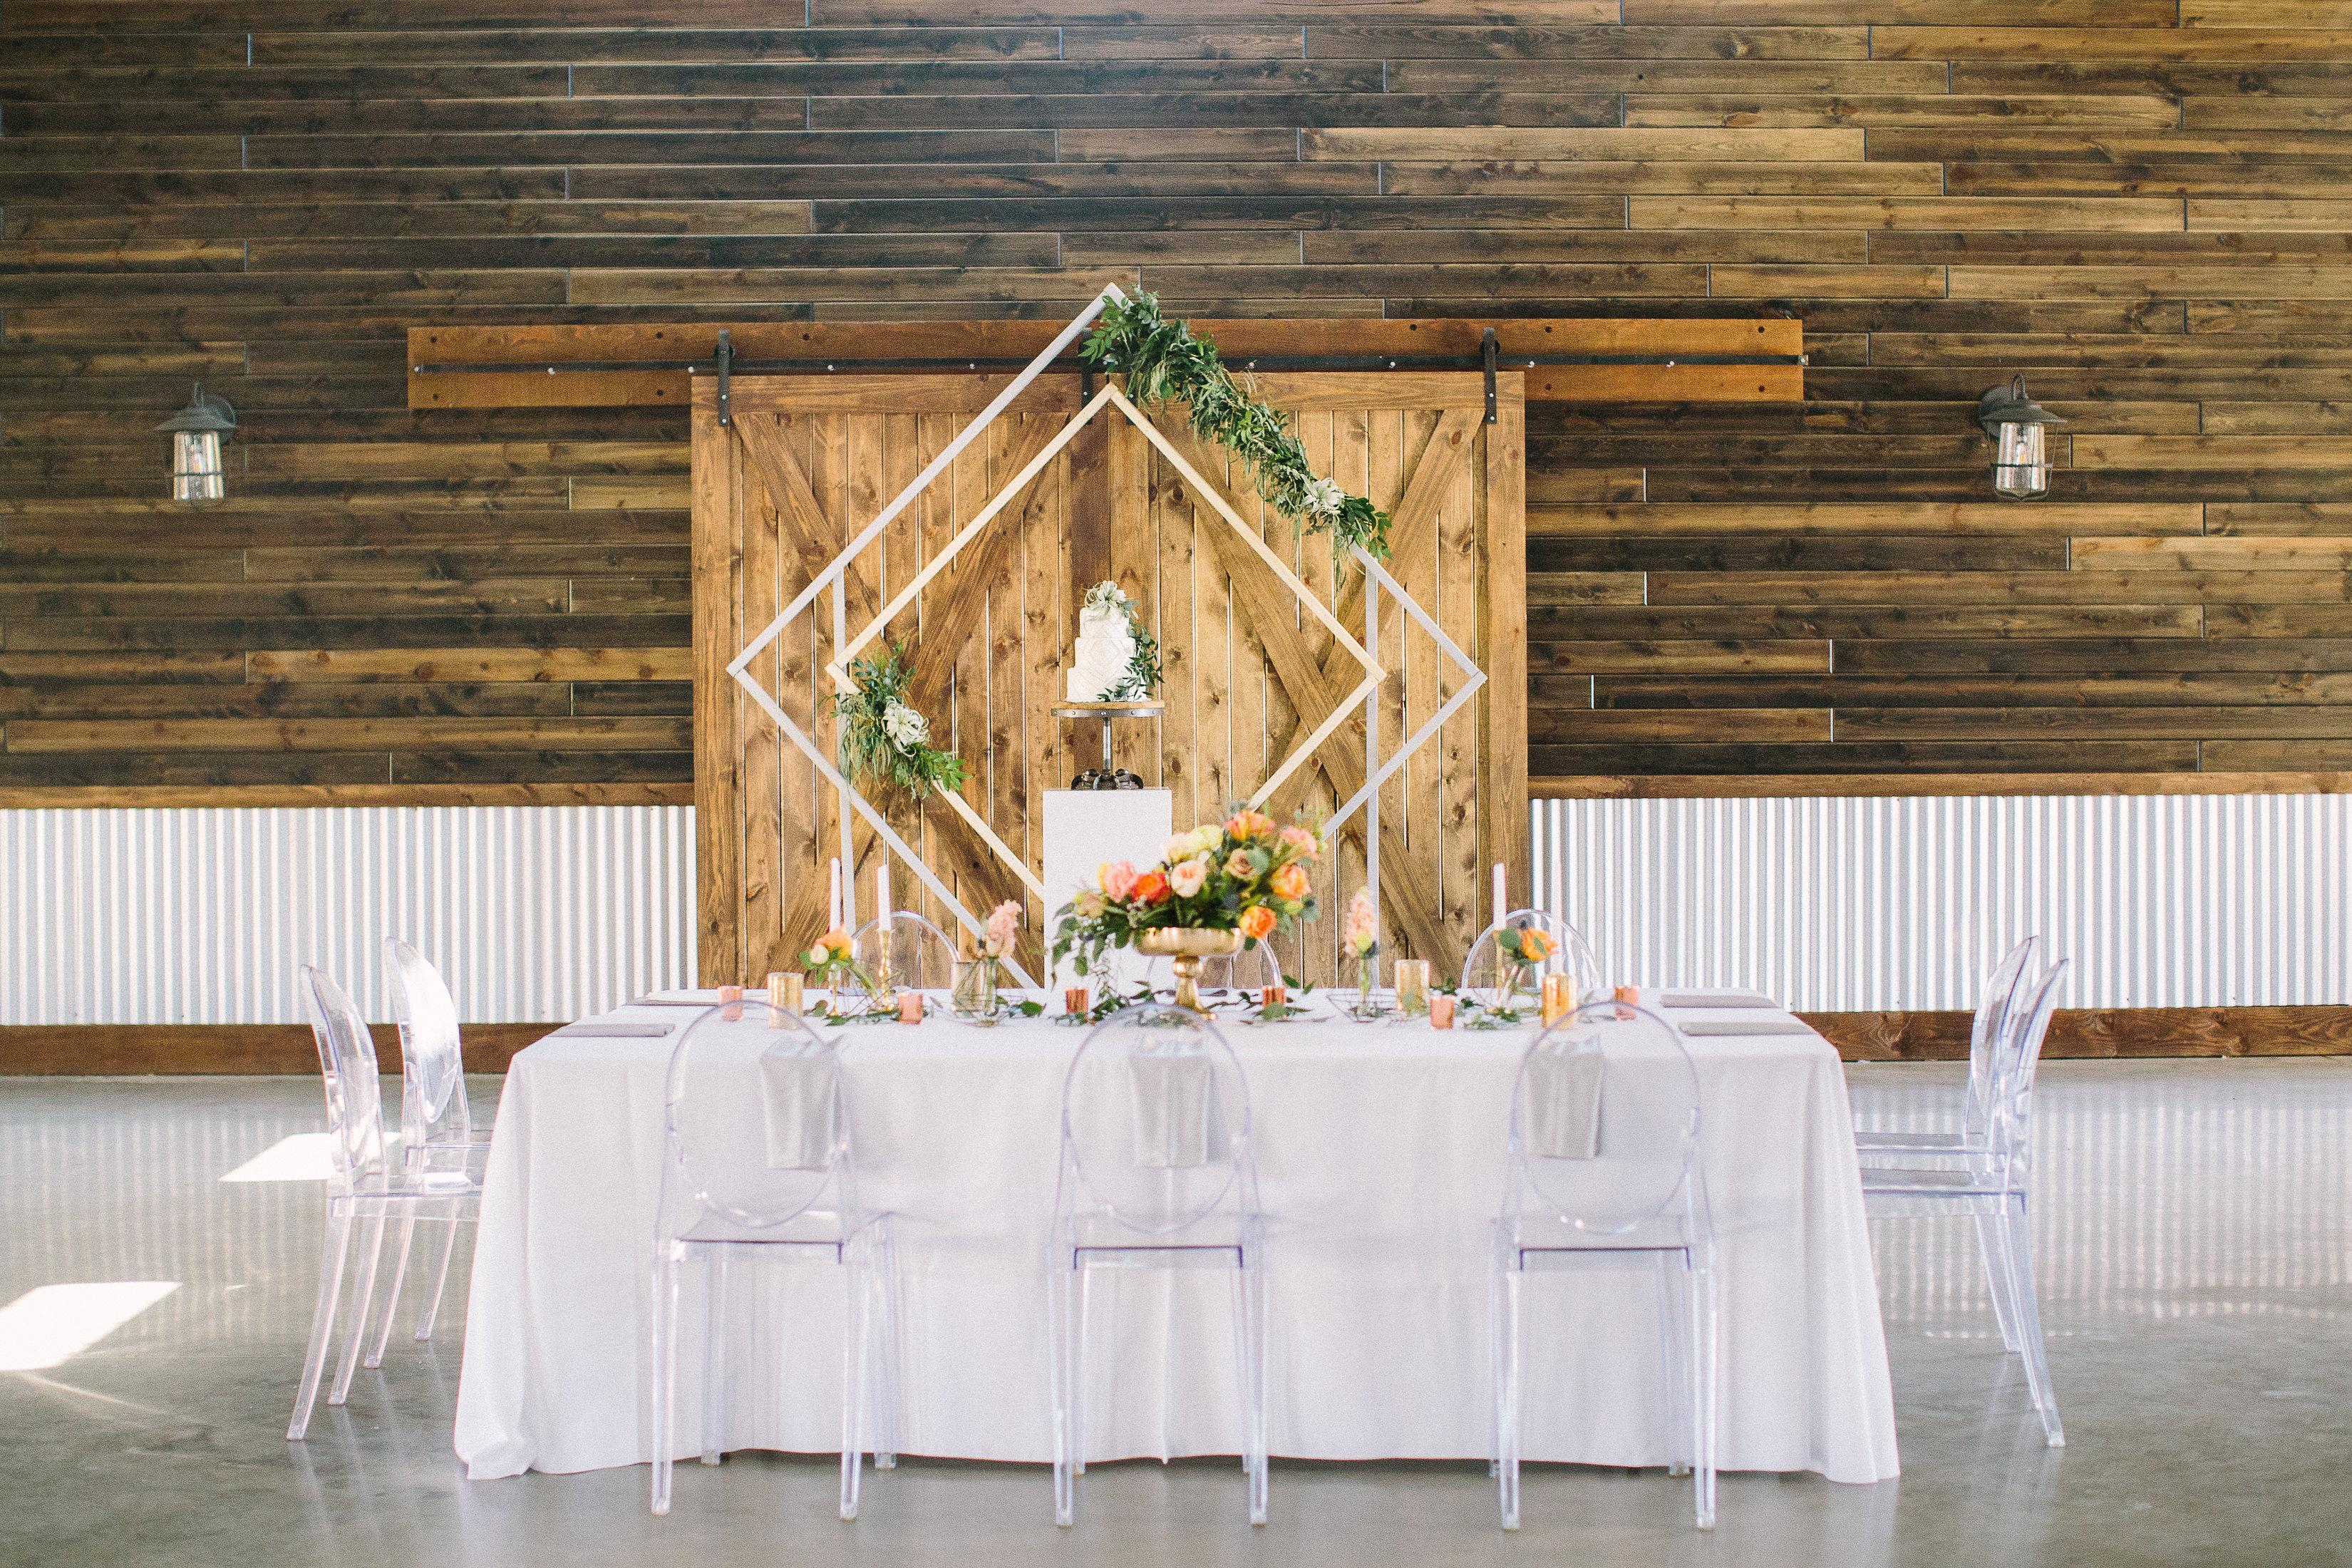 Ellen-Ashton-Photography-Peach-Creek-Ranch-Weddings-Wed-and-Prosper102